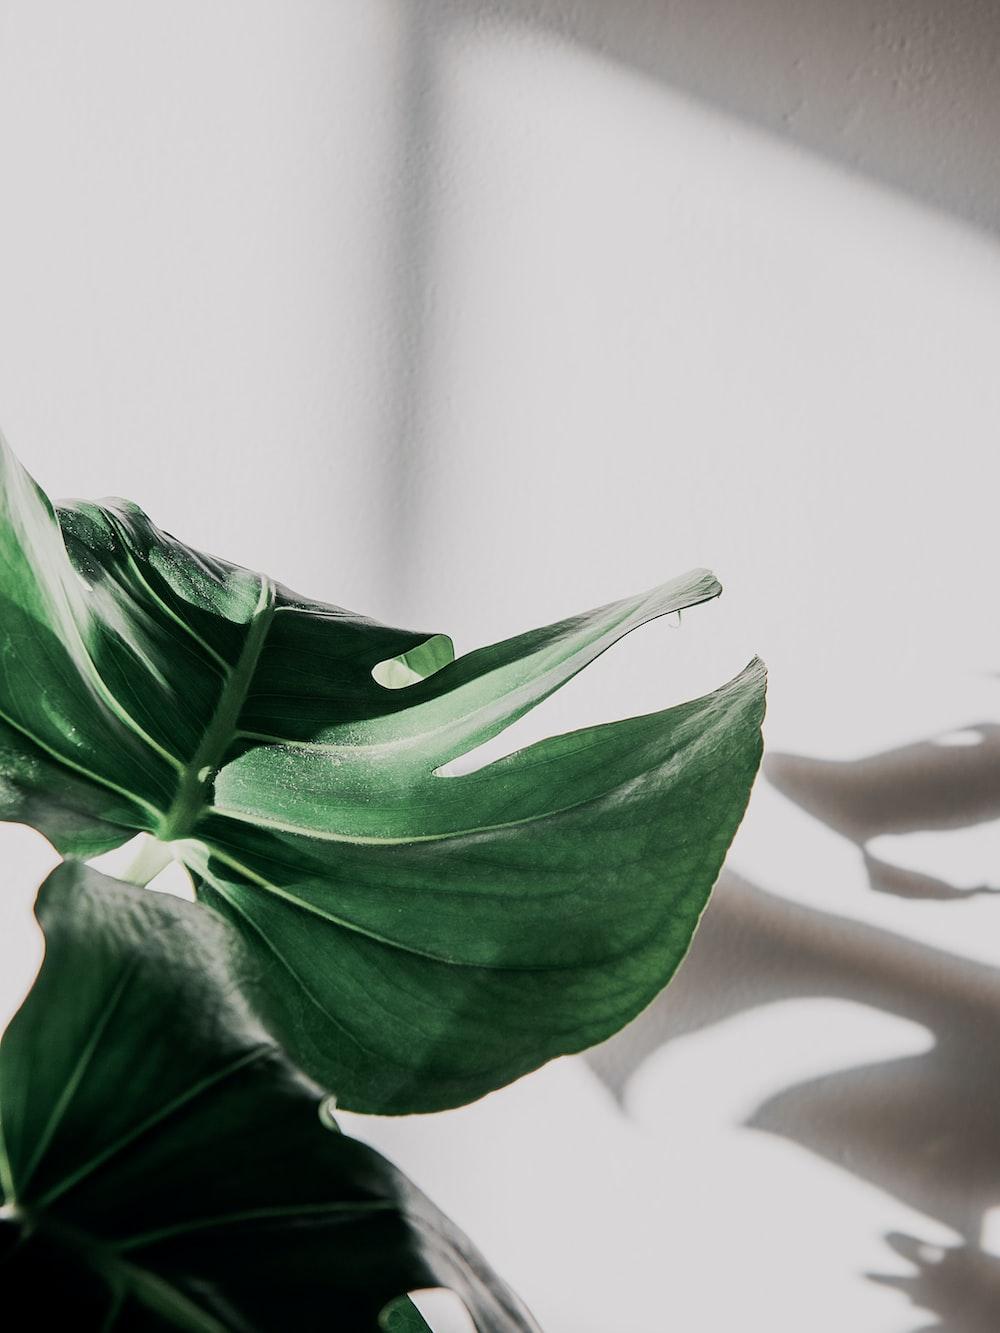 green leaf in white background